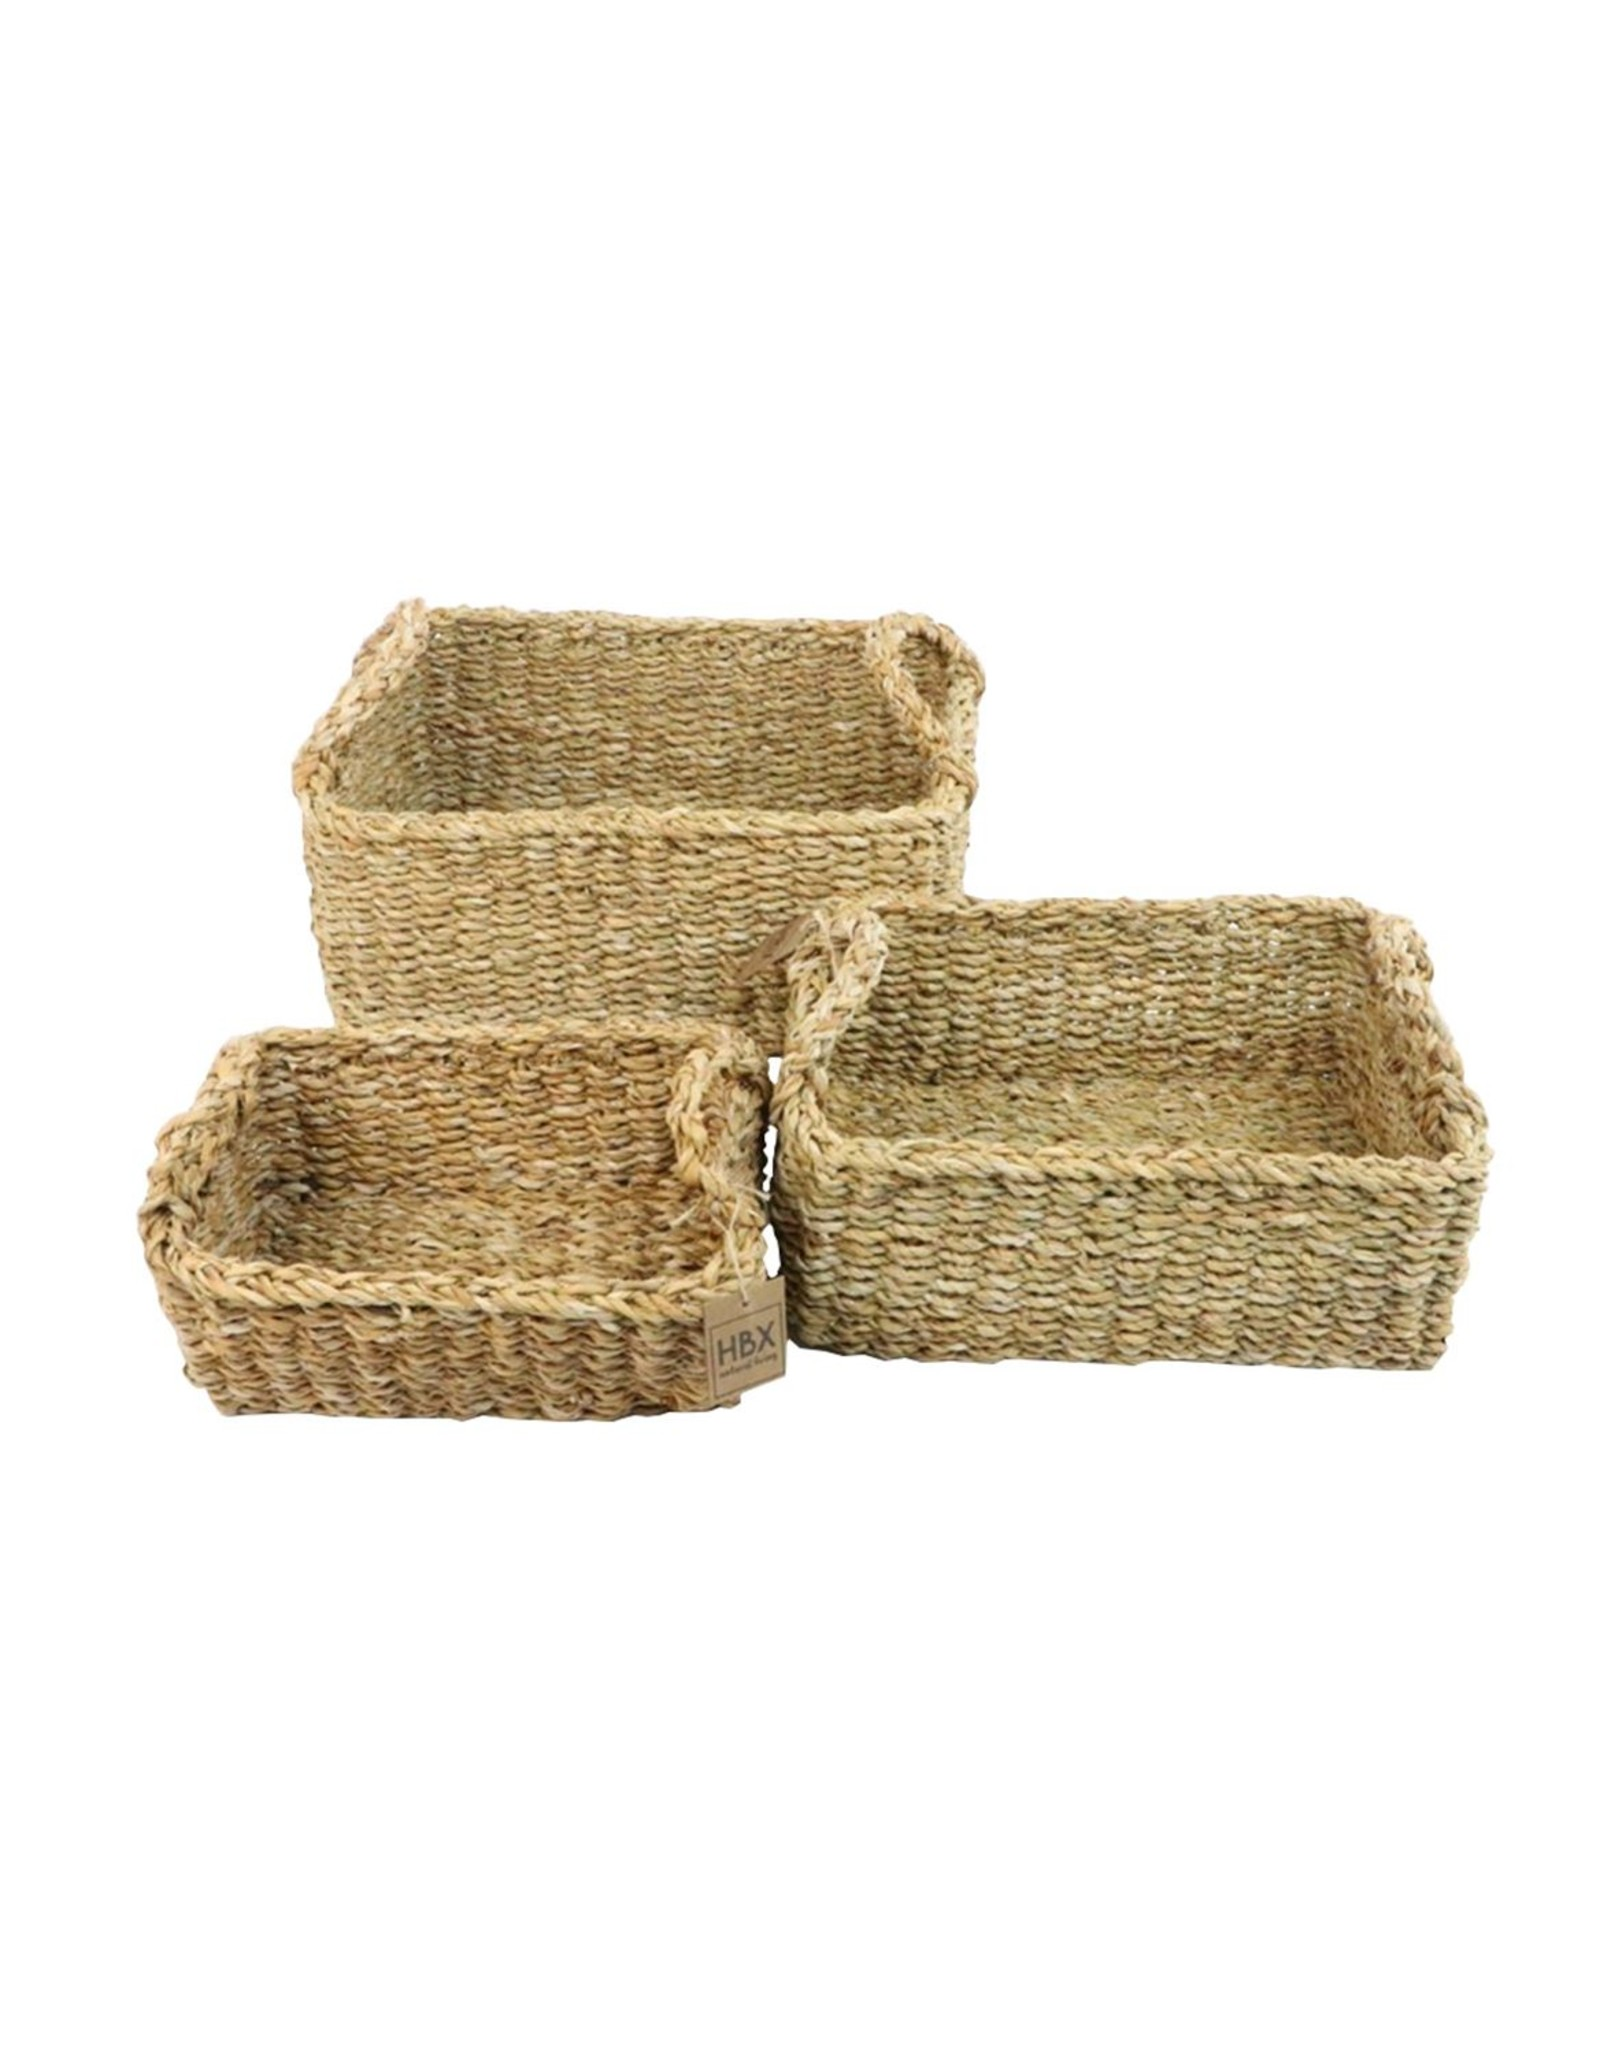 HD Bask. Manatee Grass S/3 (x 4)